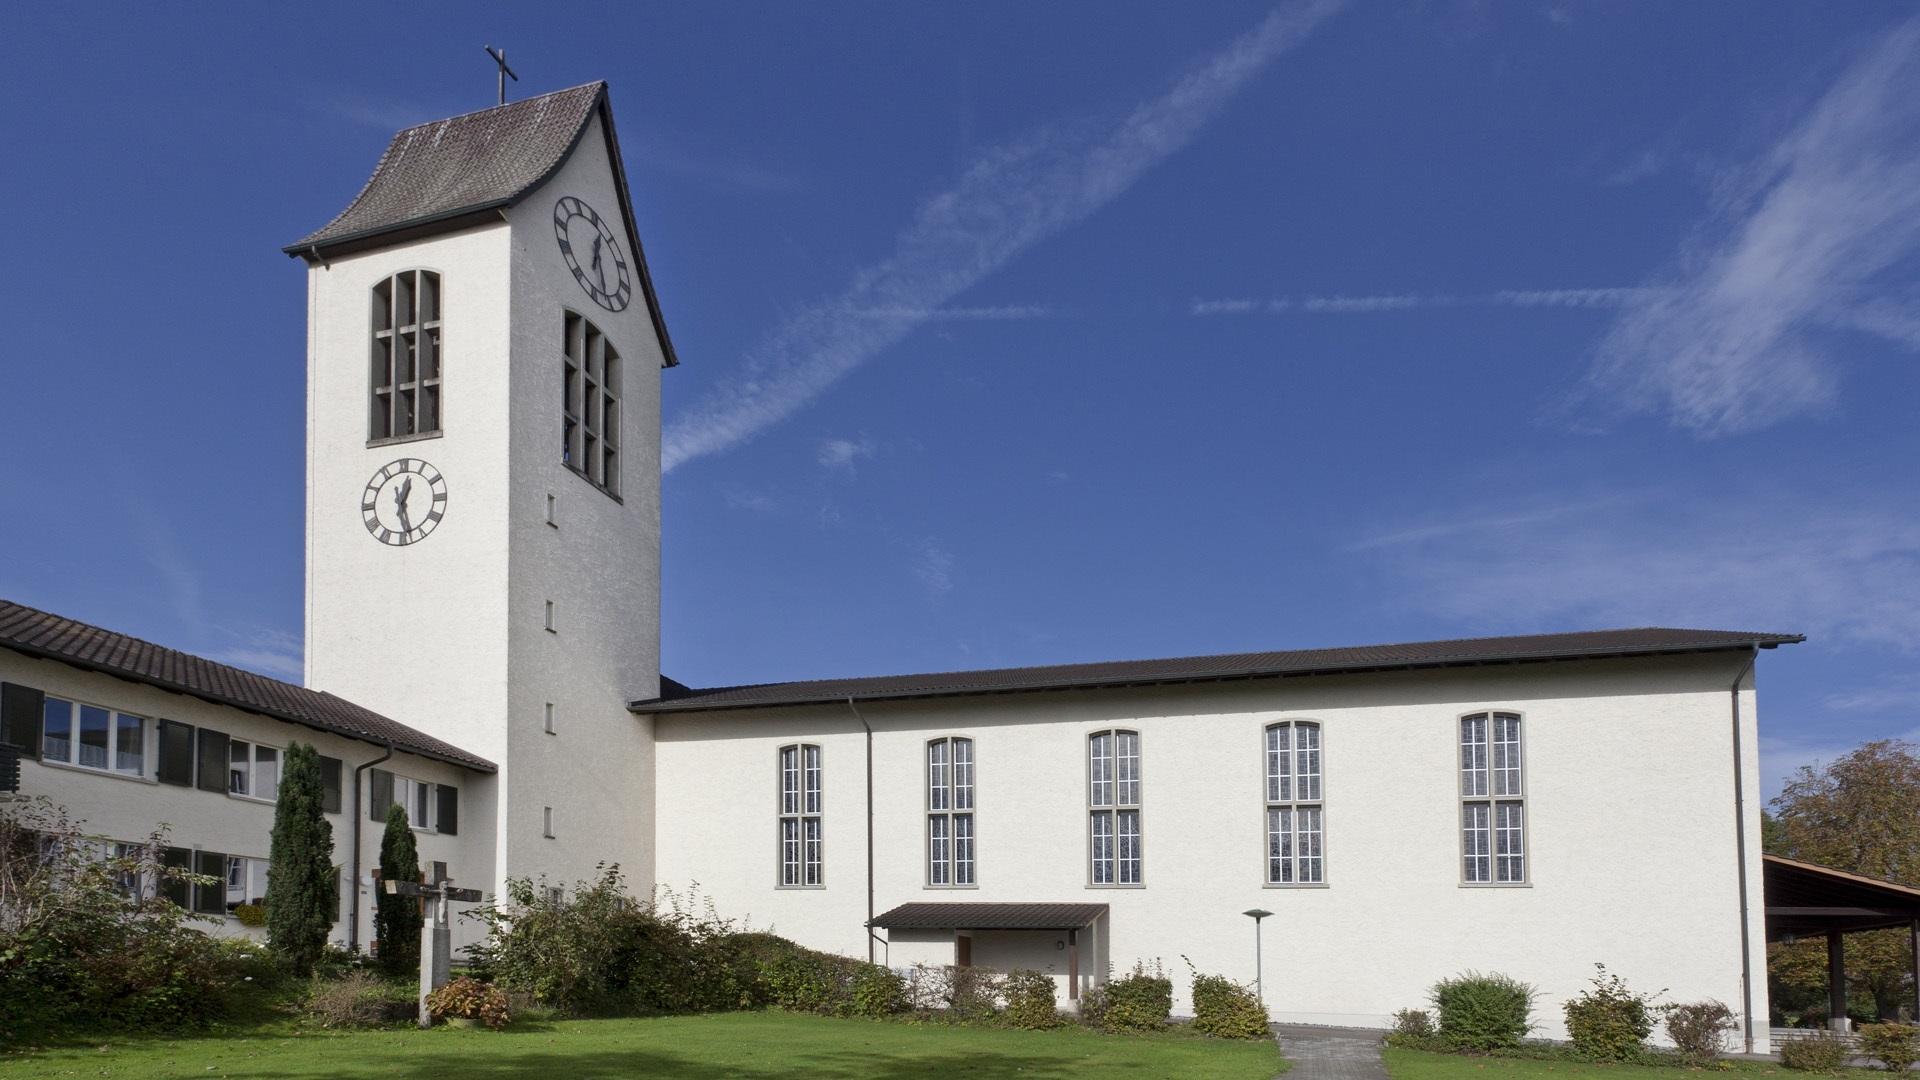 Aristau, St. Wendelin | © Roger Wehrli